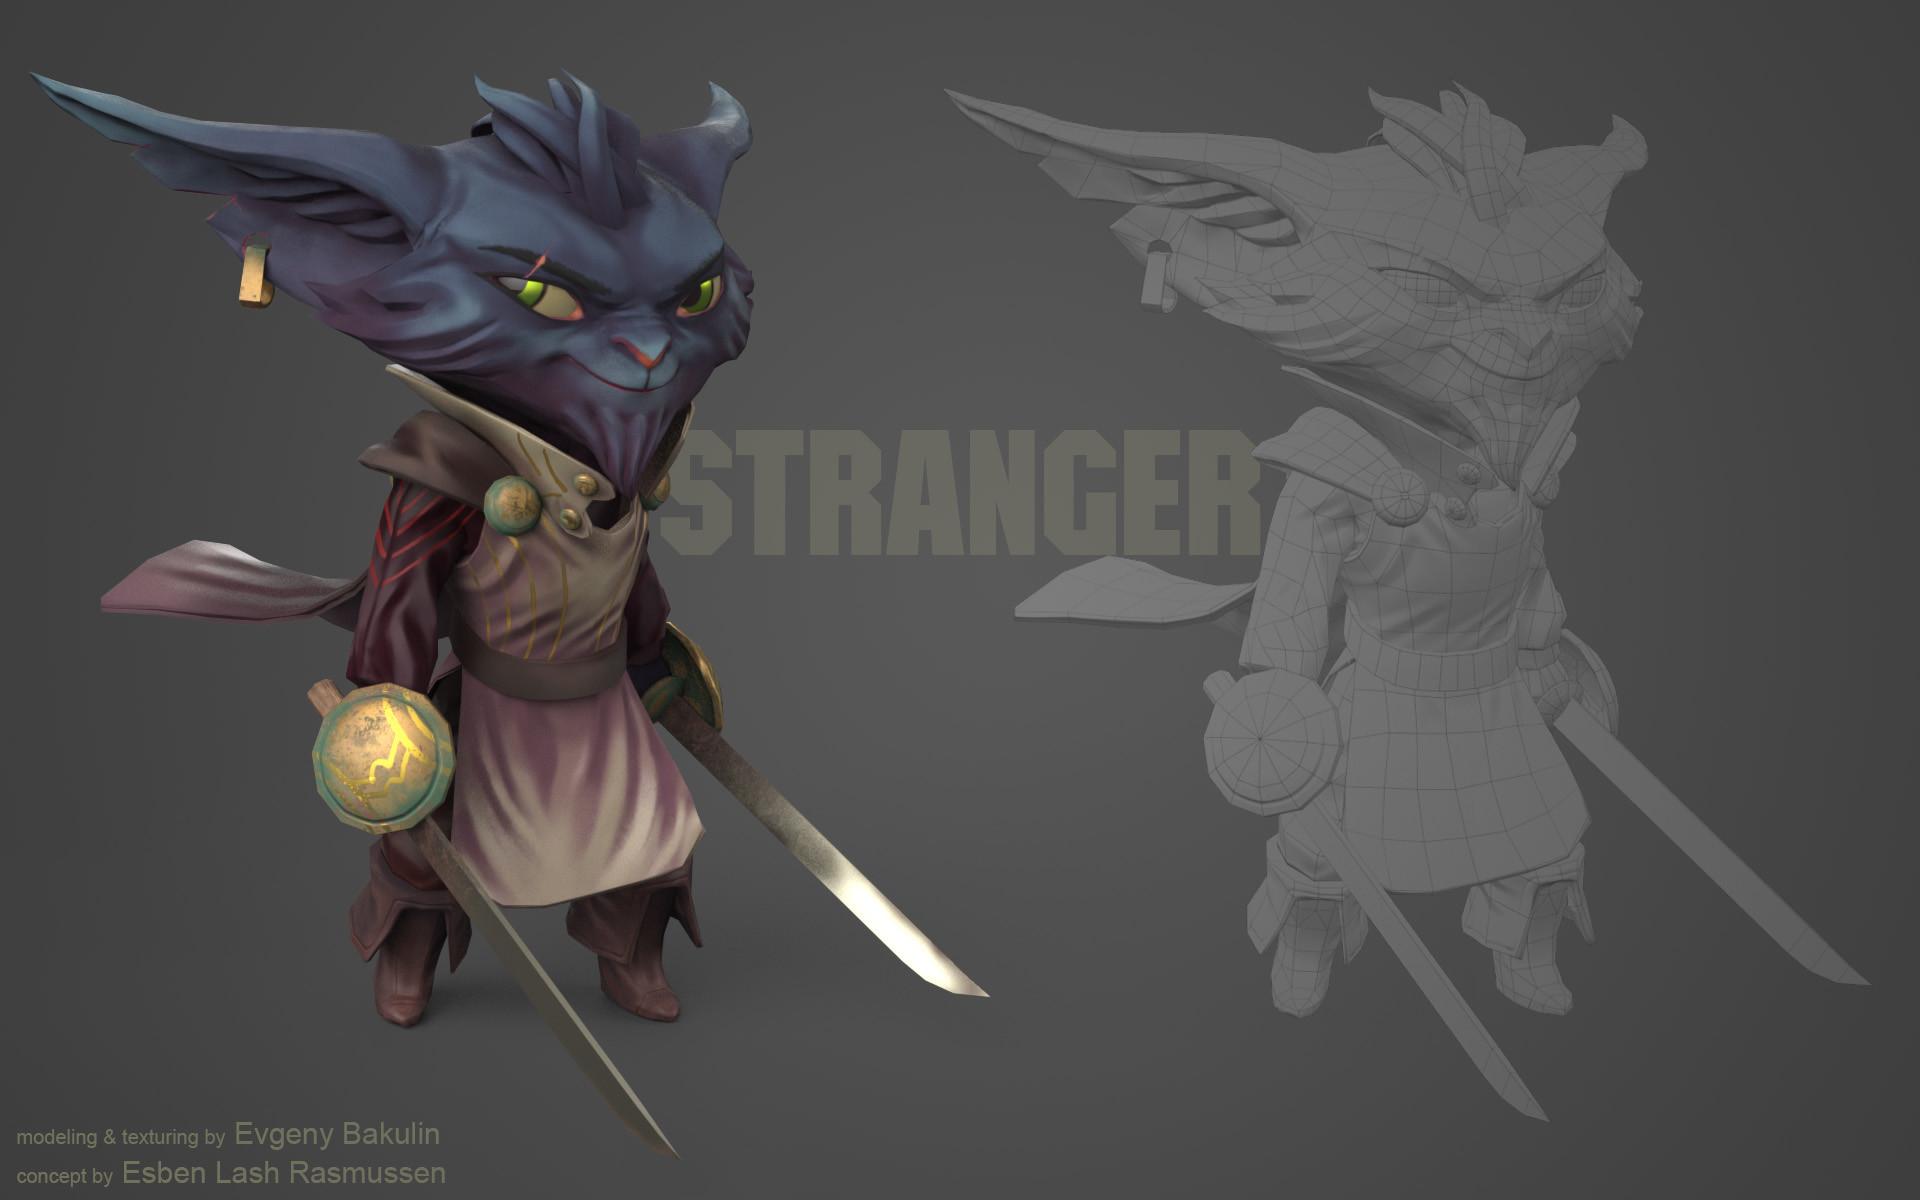 Evgeny bakulin stranger 1